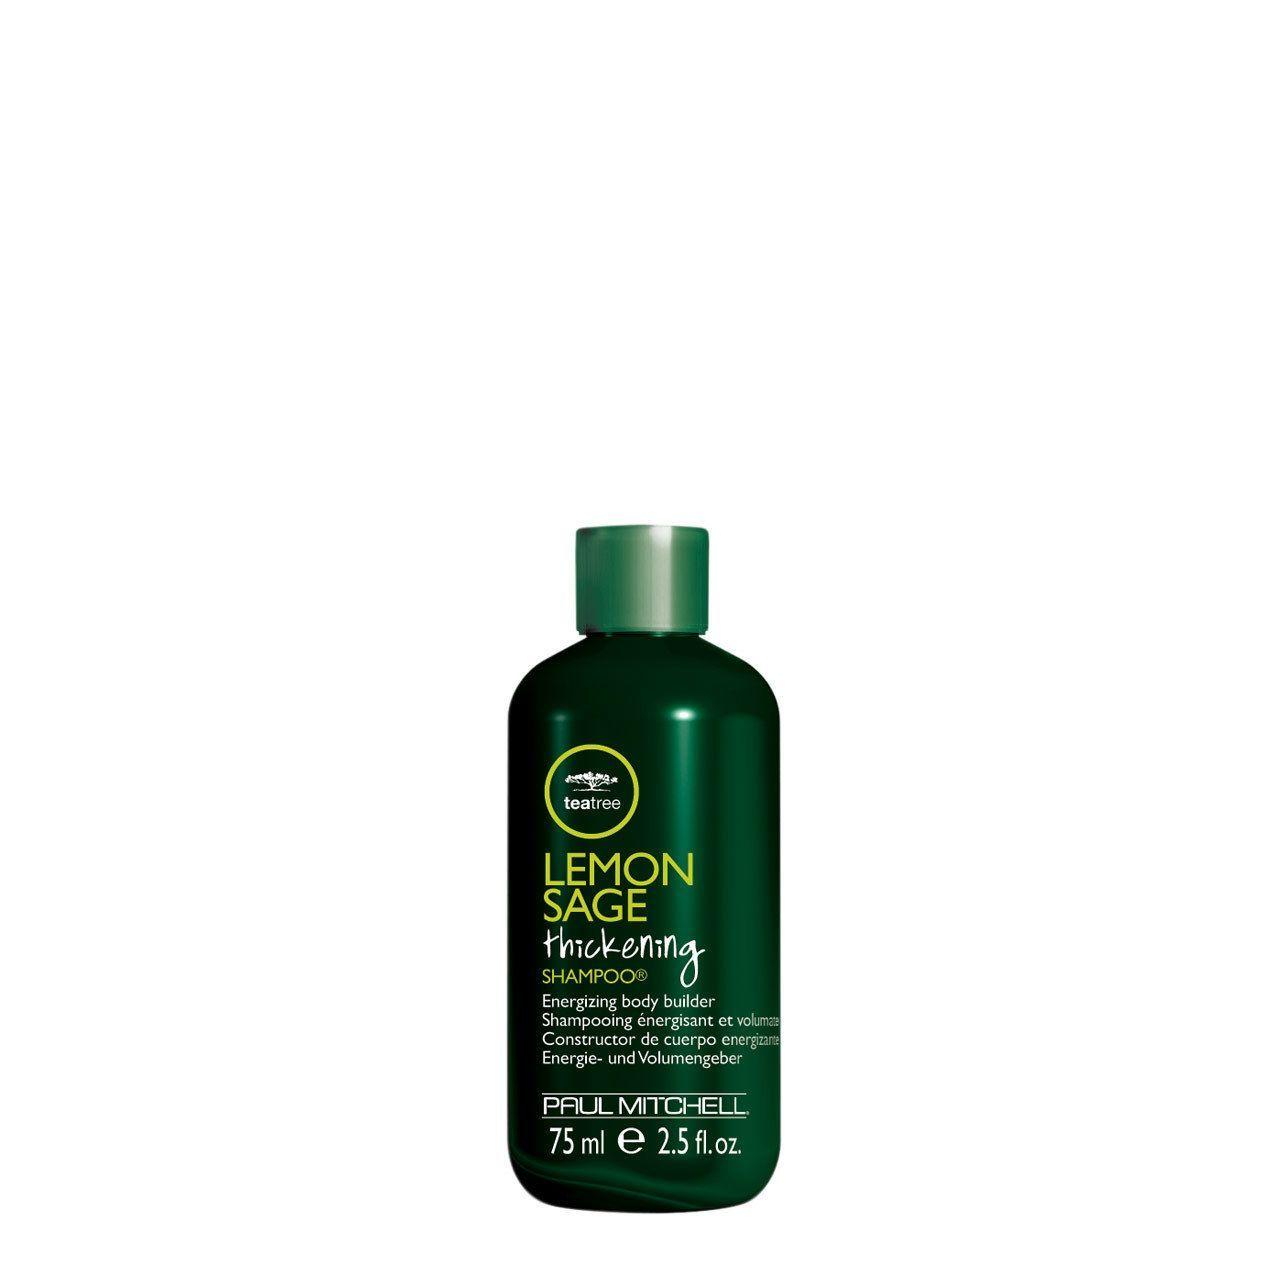 Paul Mitchell Tea Tree Lemon Sage Thickening Shampoo - 75ml